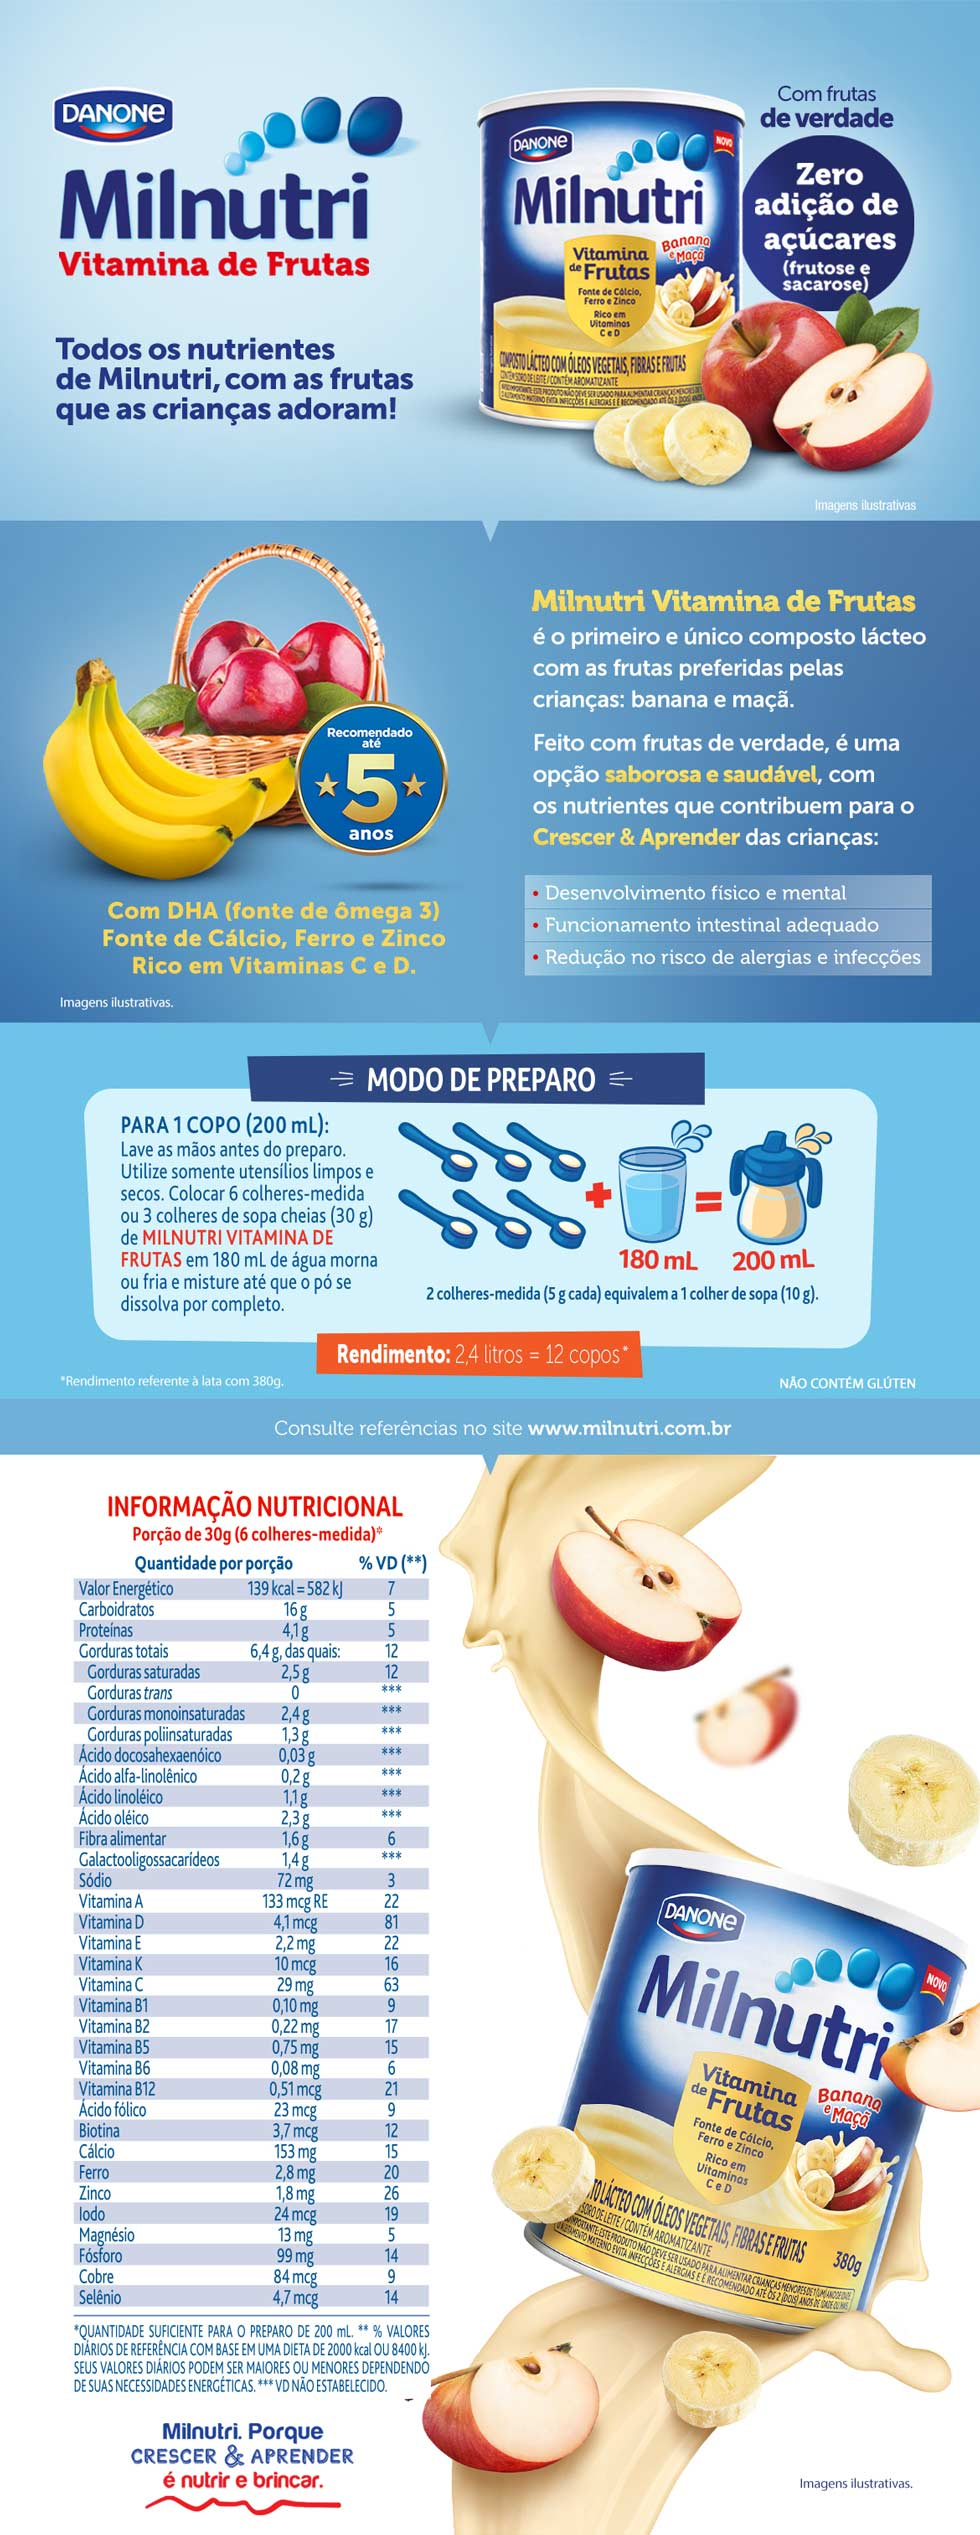 Milnutri Vitamina de Frutas Danone Composto Lácteo com Frutas 380g